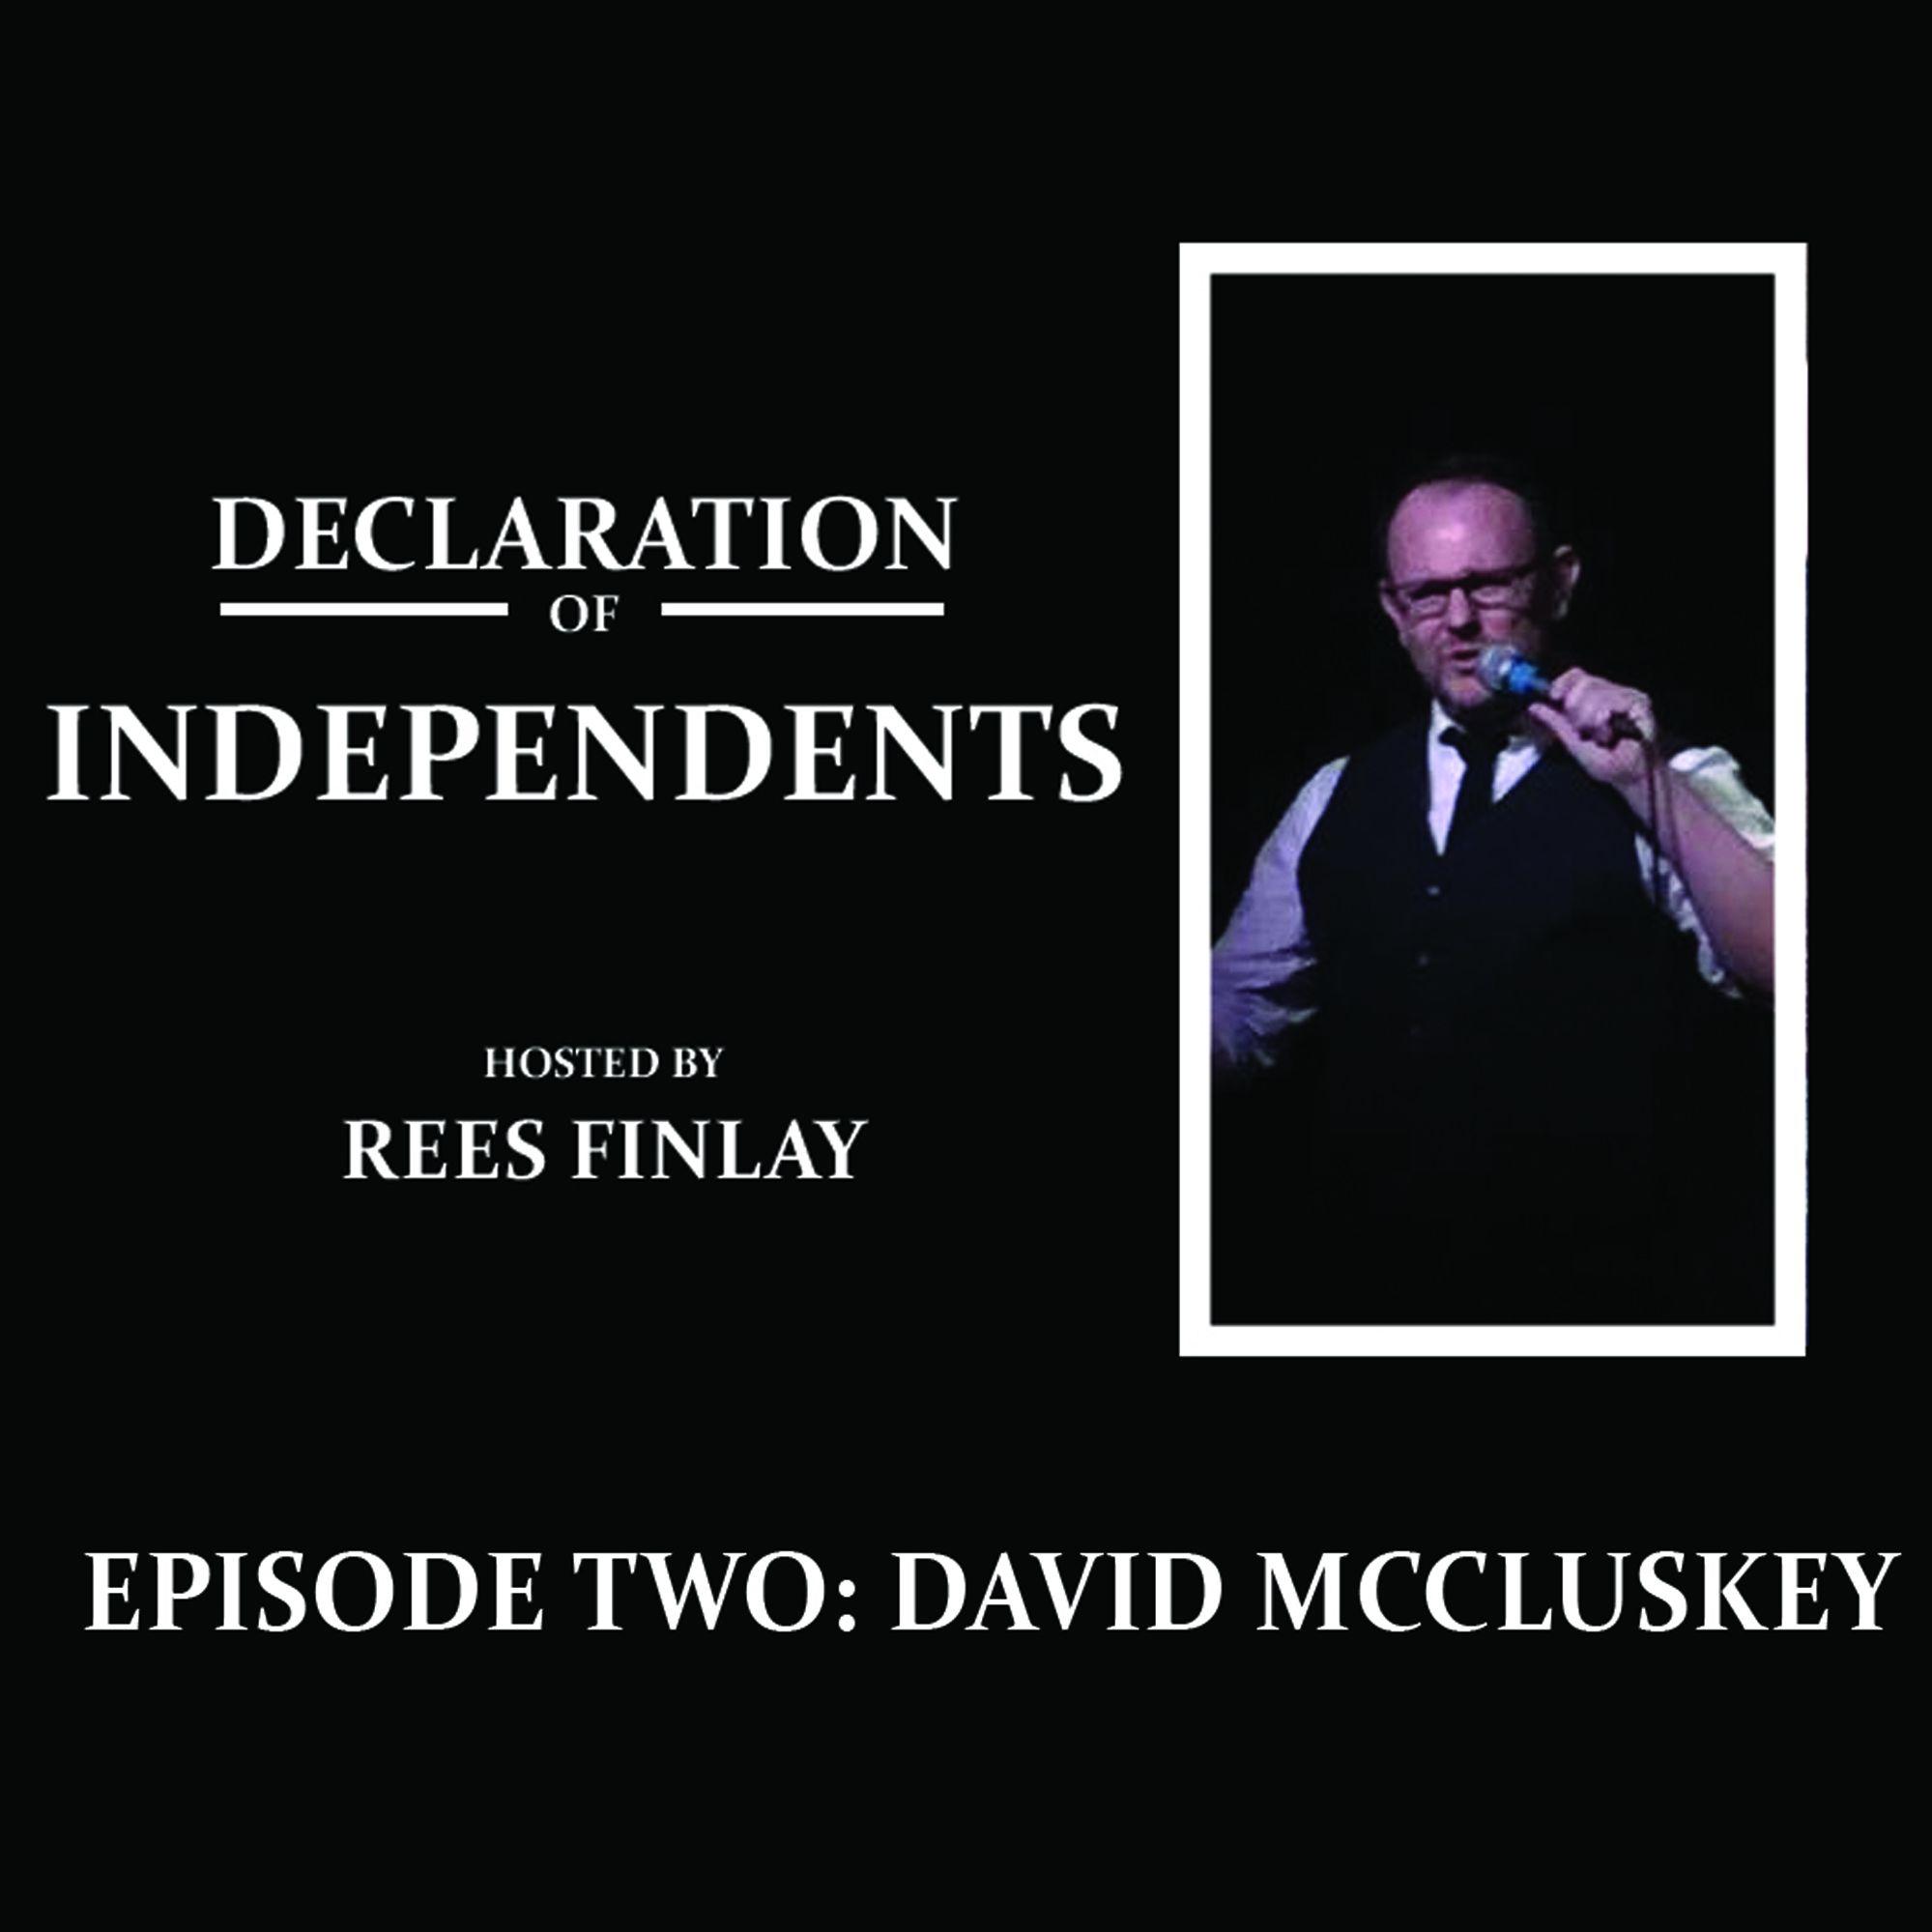 Episode Two: David McCluskey